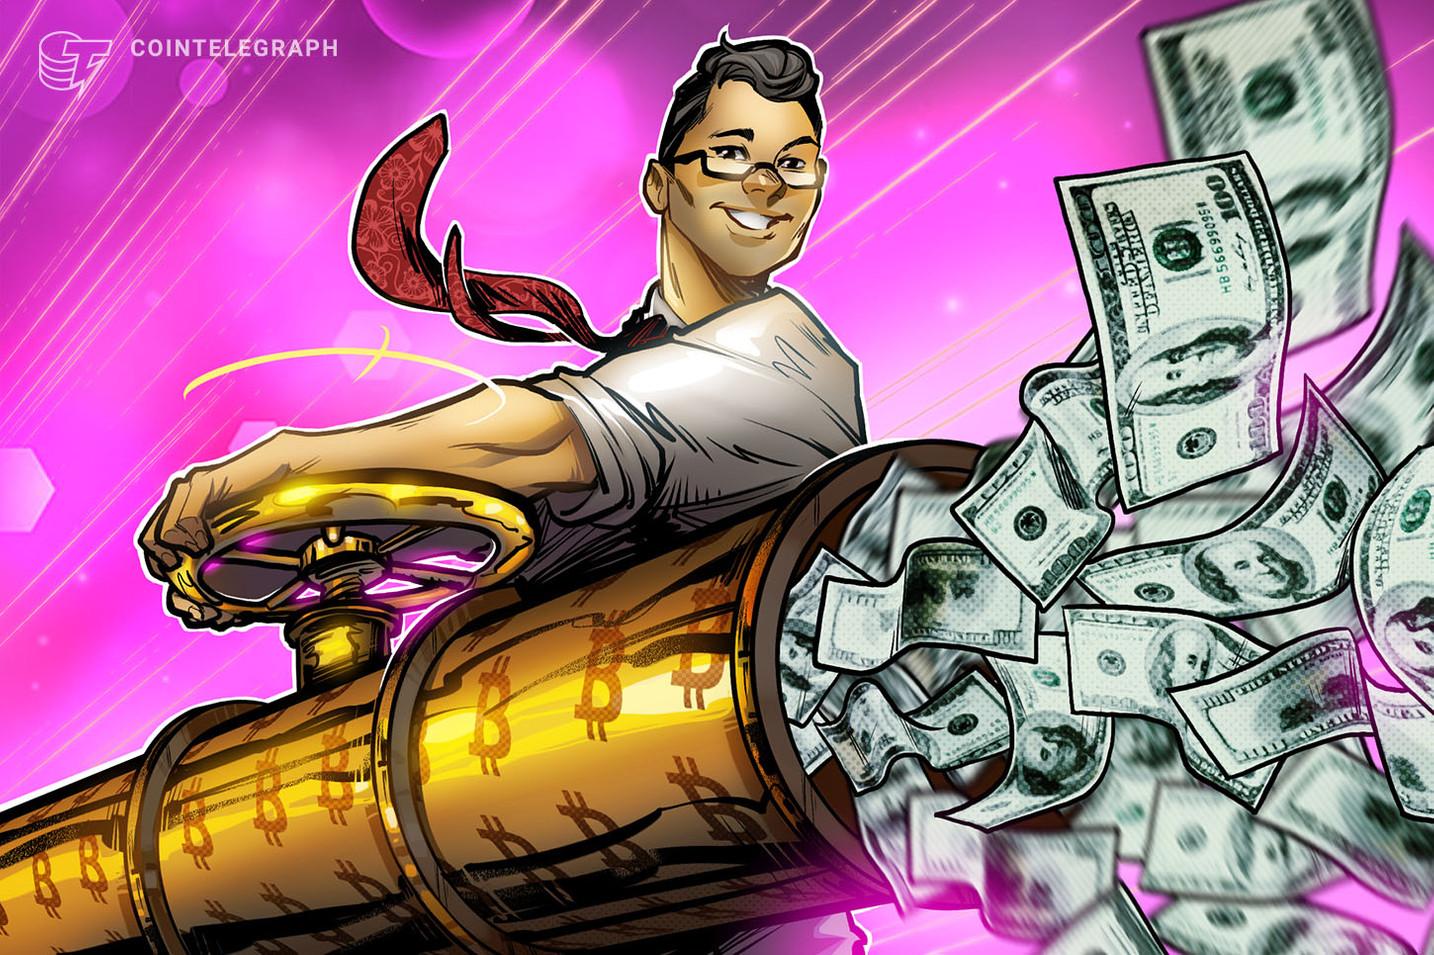 China está sacando dinero de EE.UU. con Bitcoin